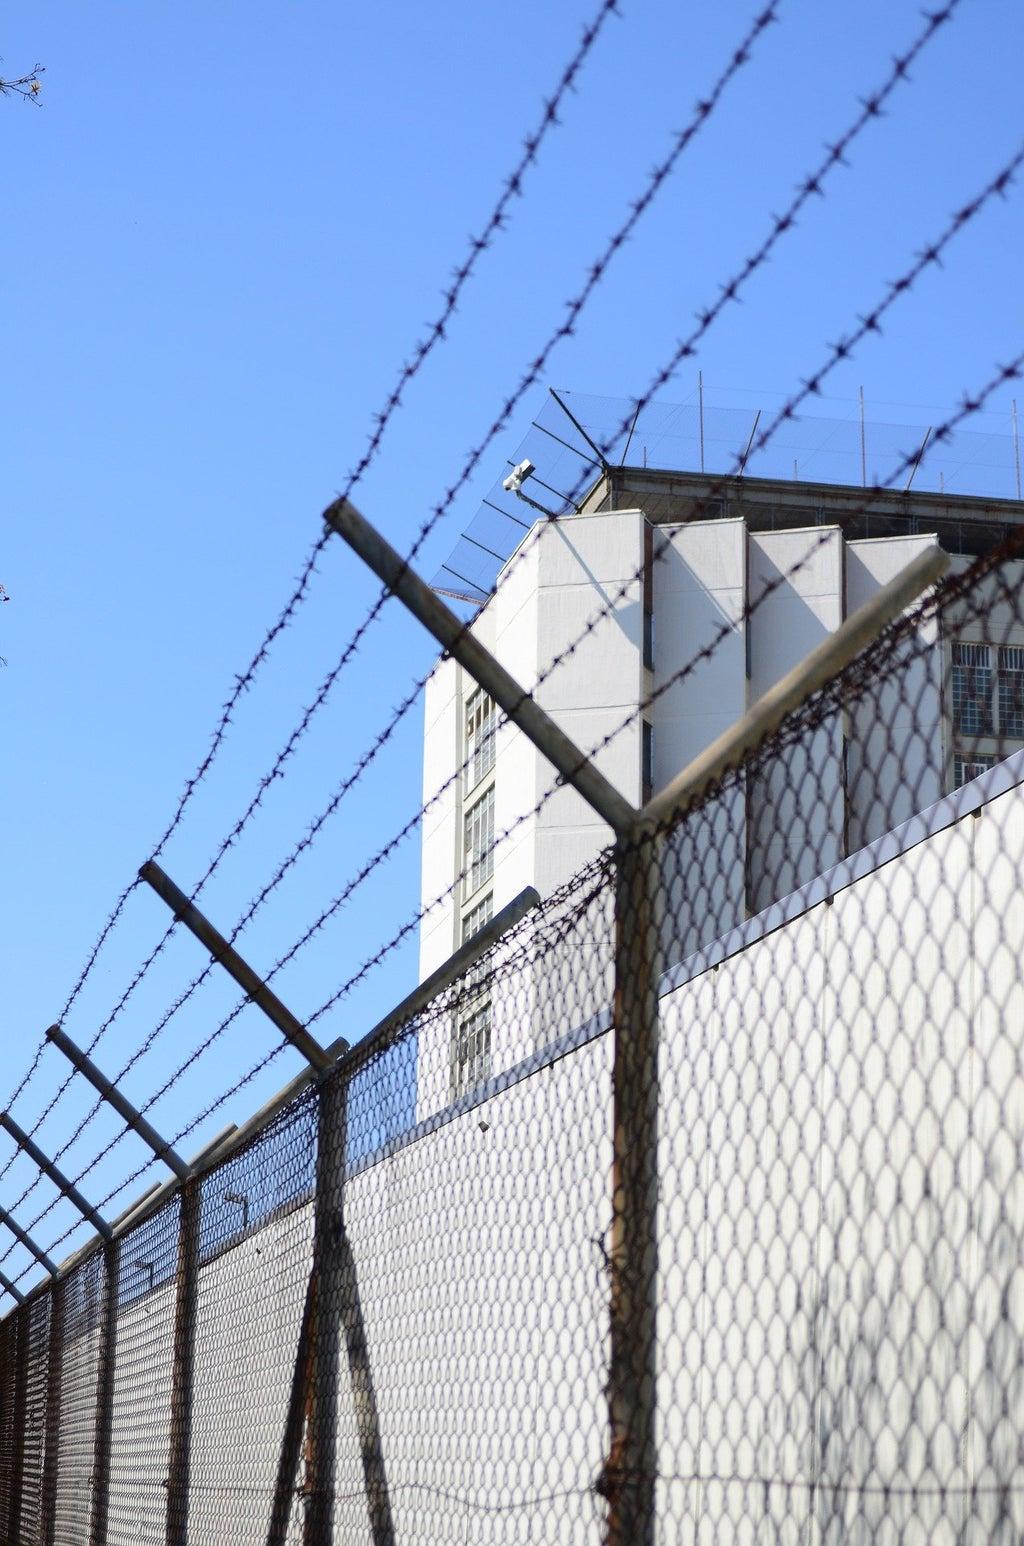 prison fence white building